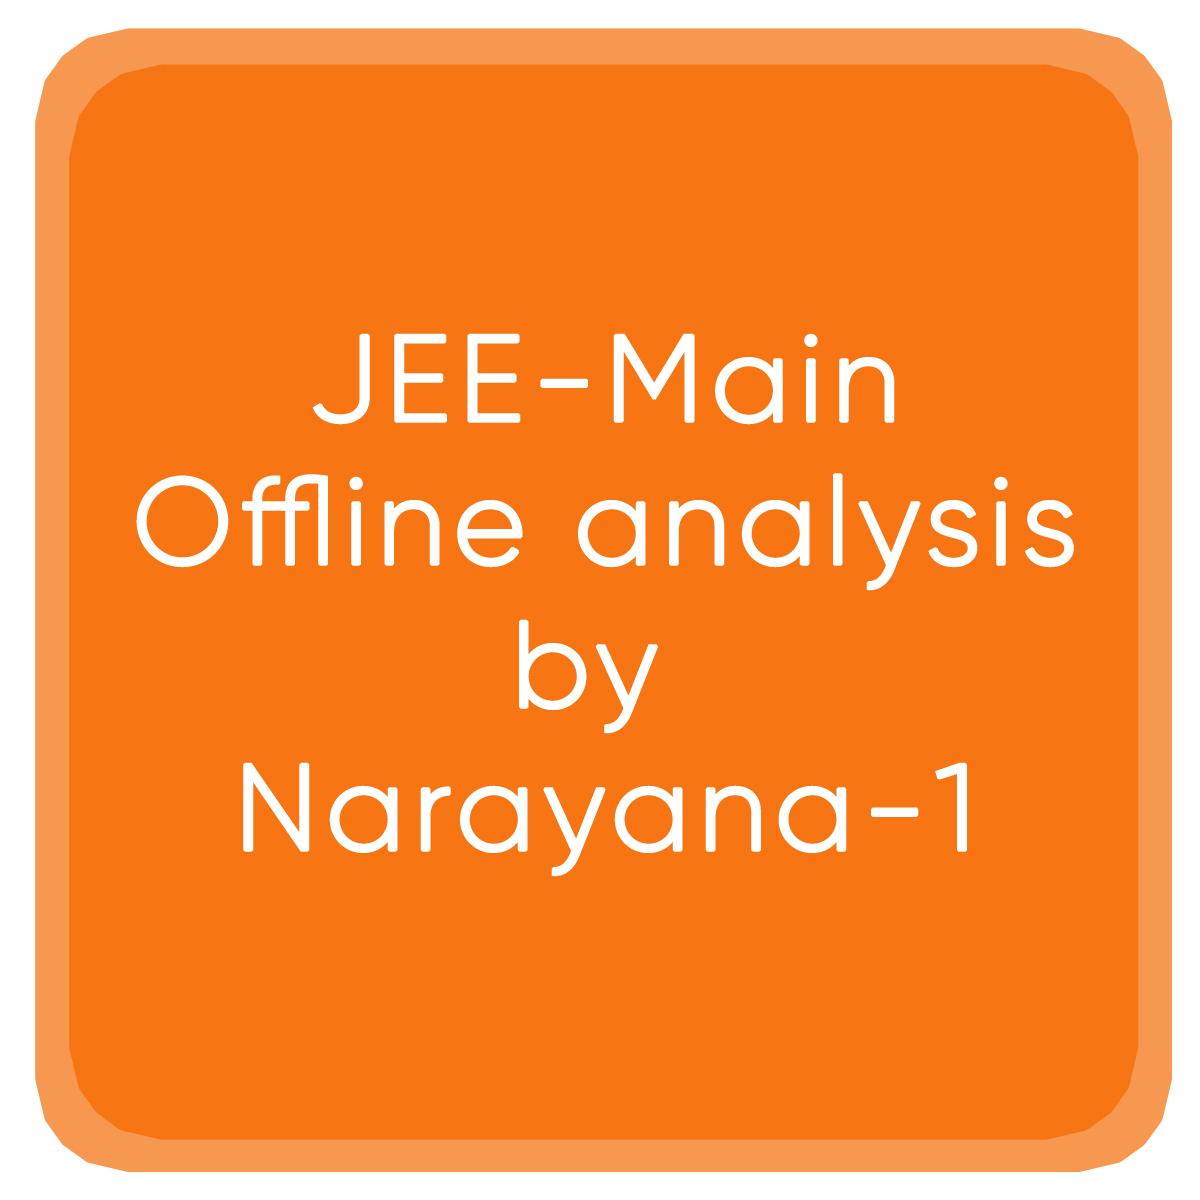 JEE-Main-Offline-analysis-by Narayana-1